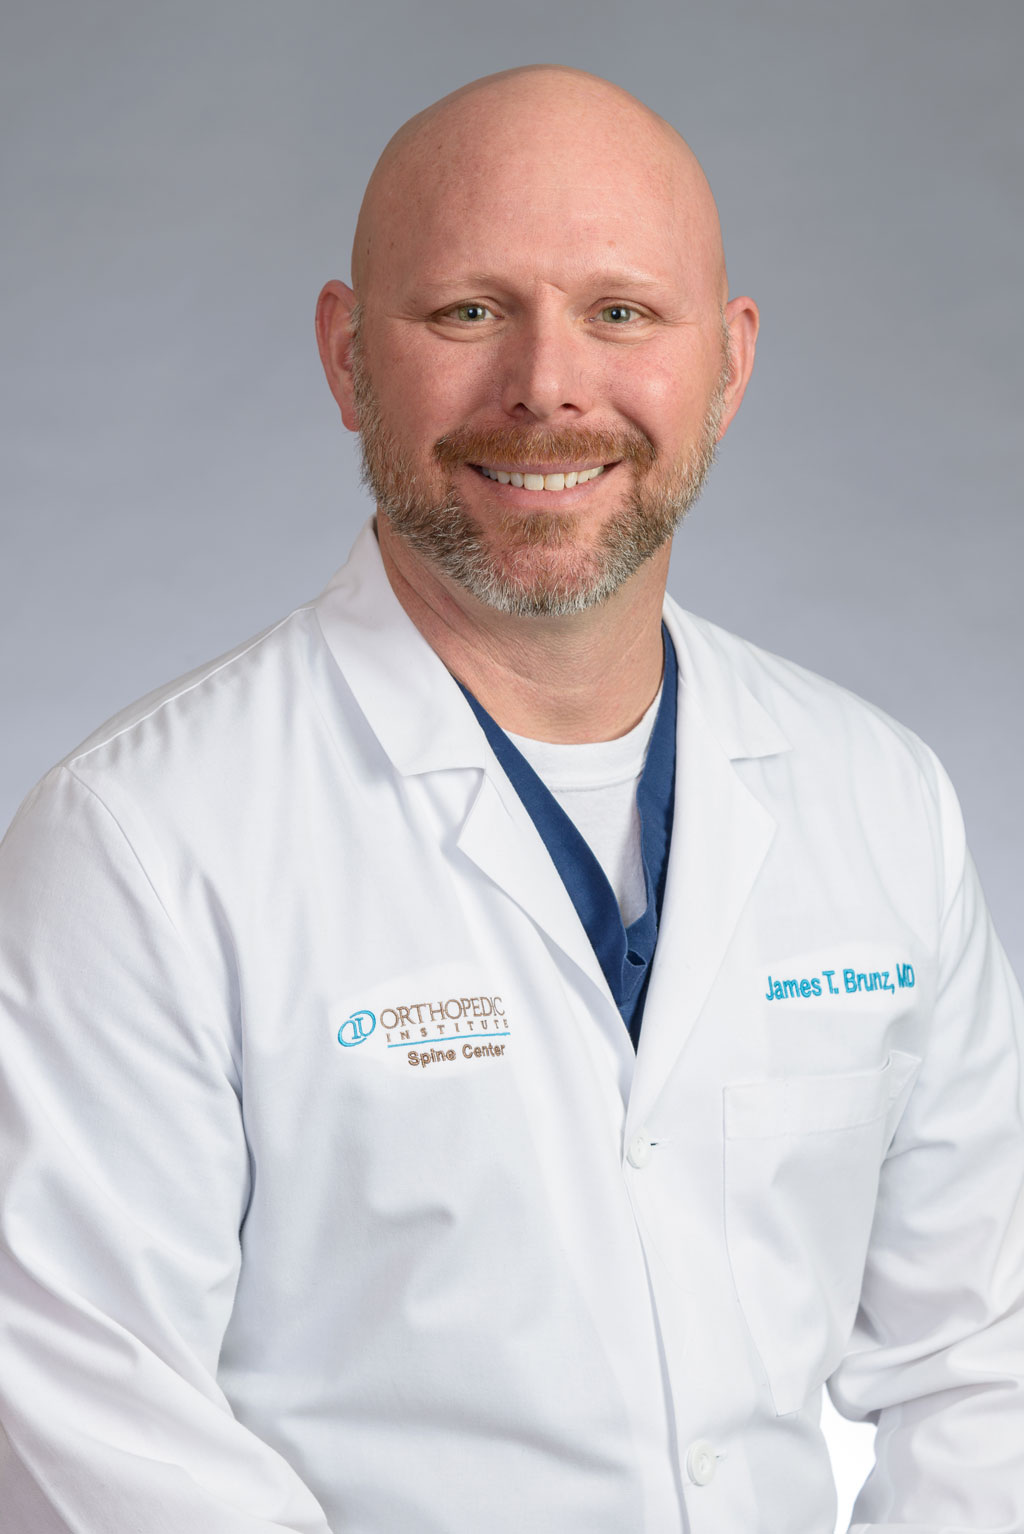 James T Bruz, MD